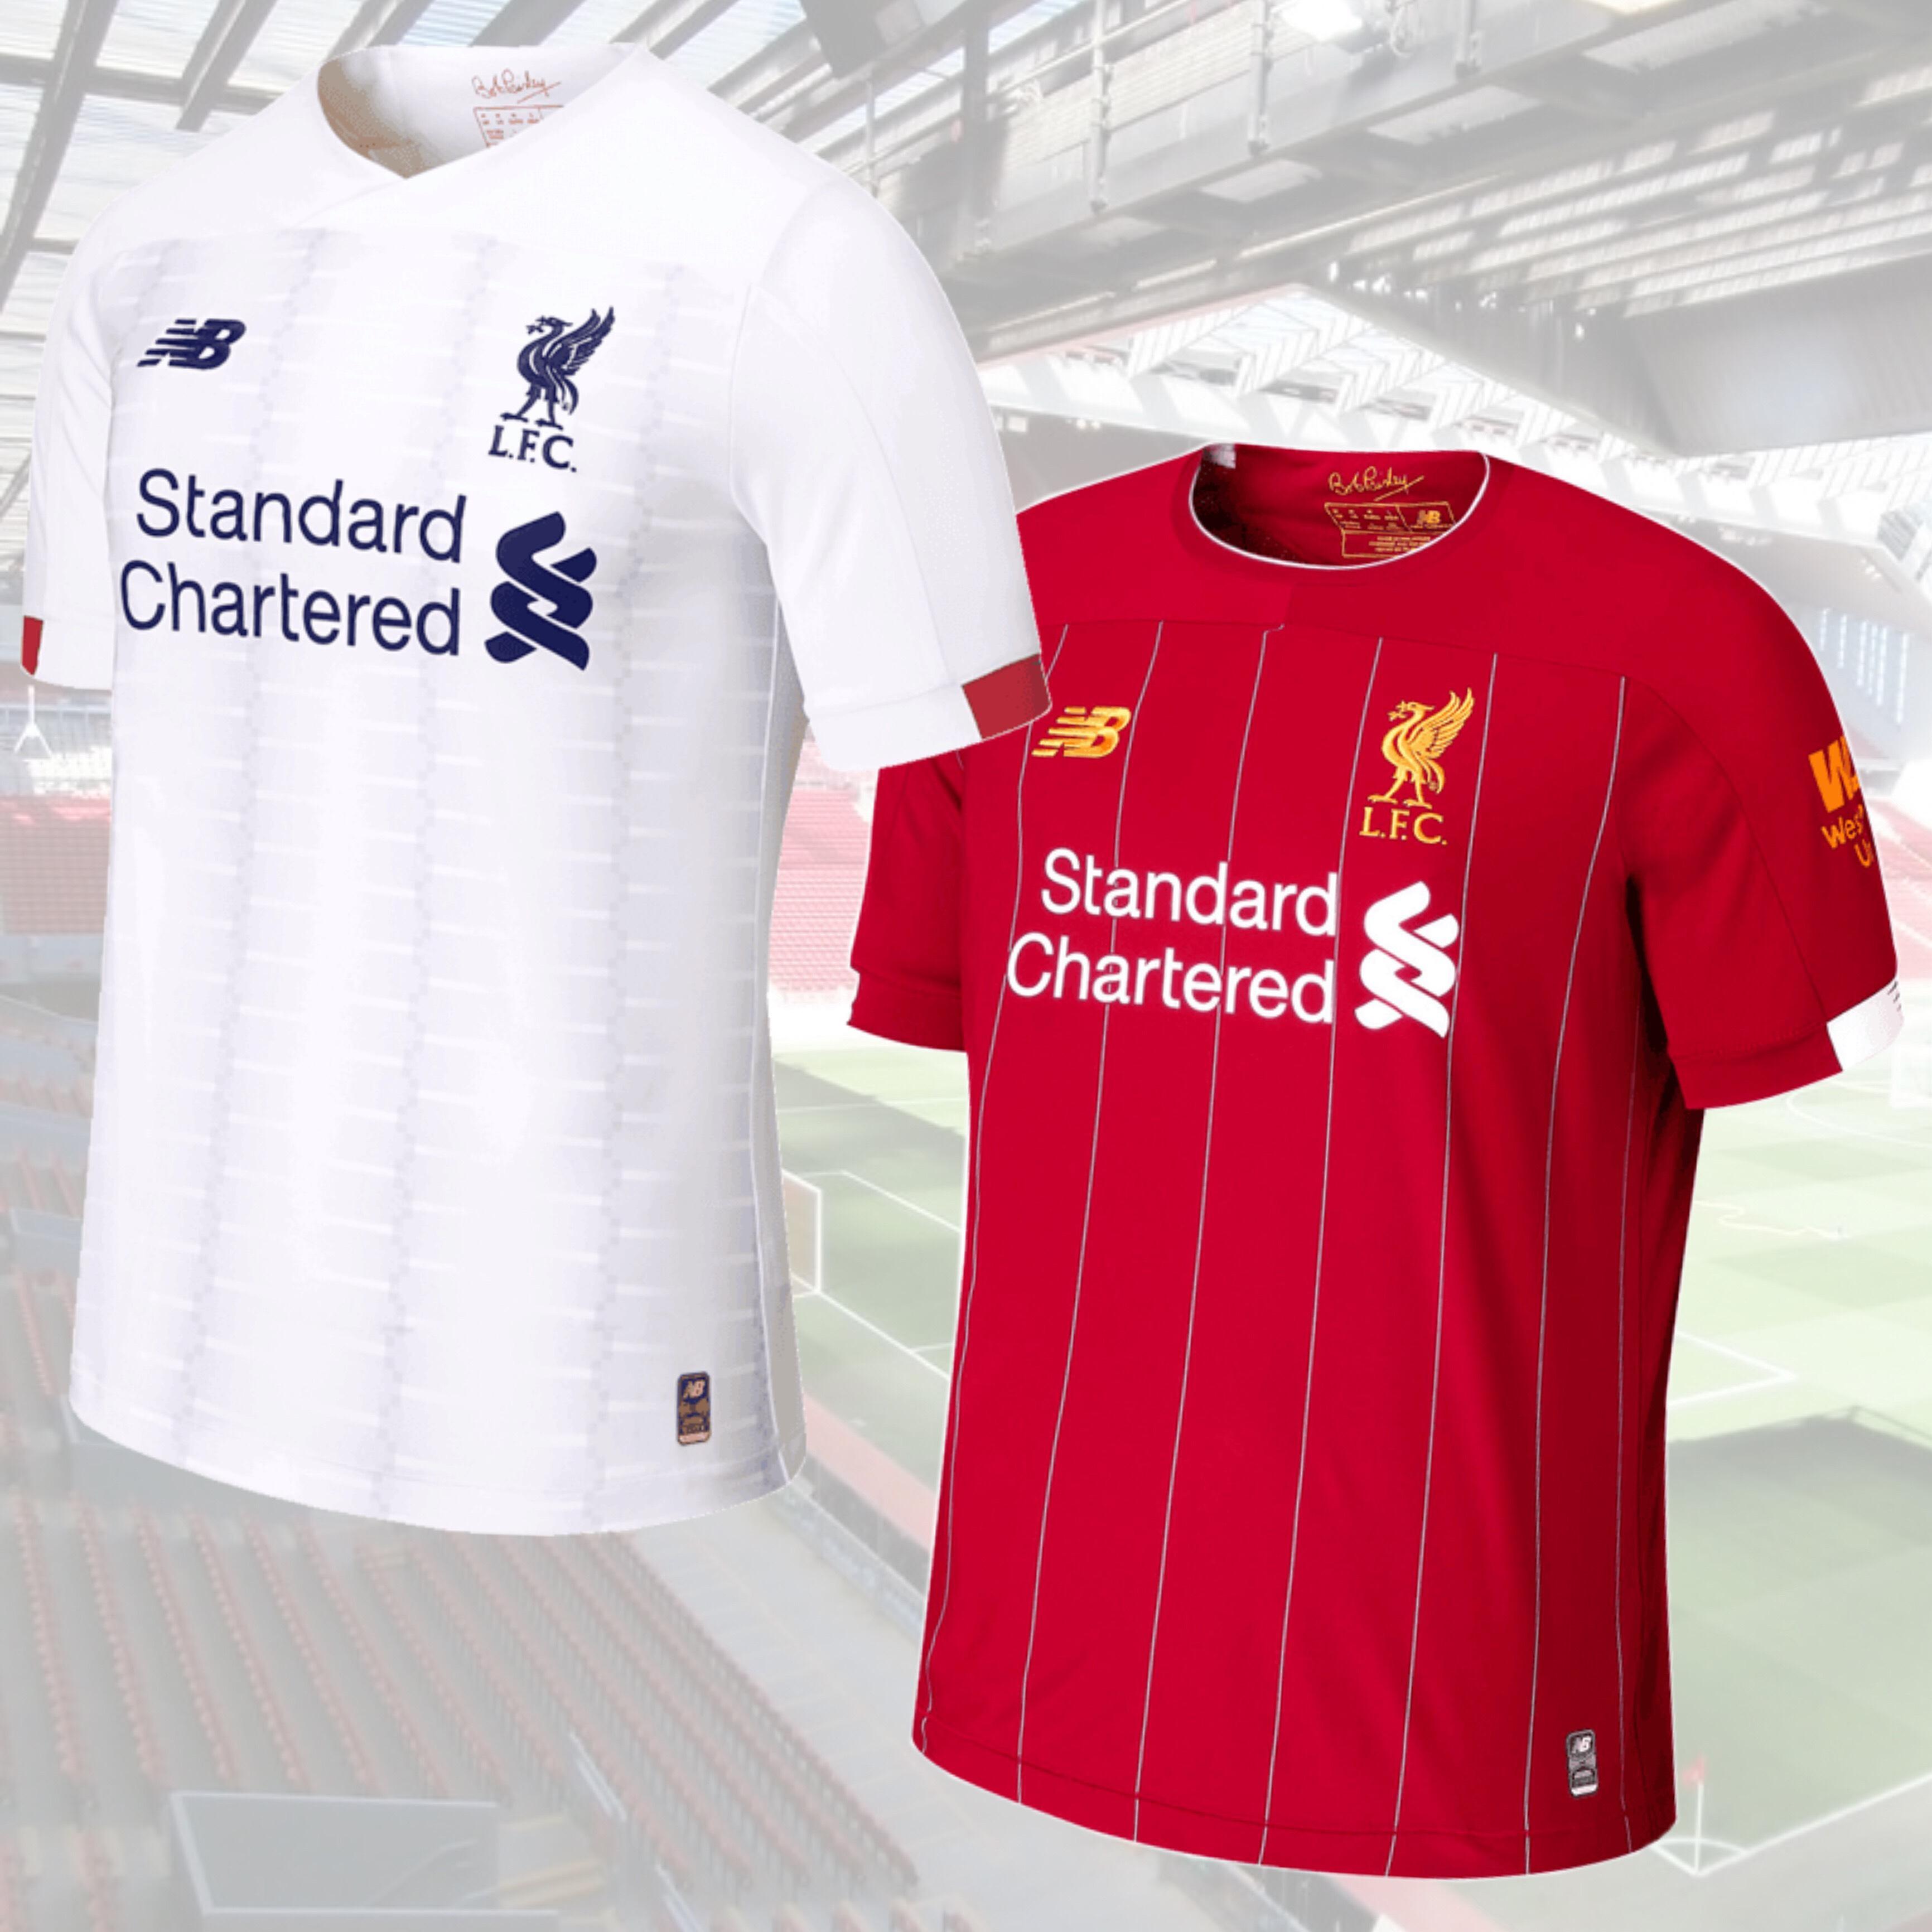 Liverpool FC Trikots 19/20 im Sale [-33%]